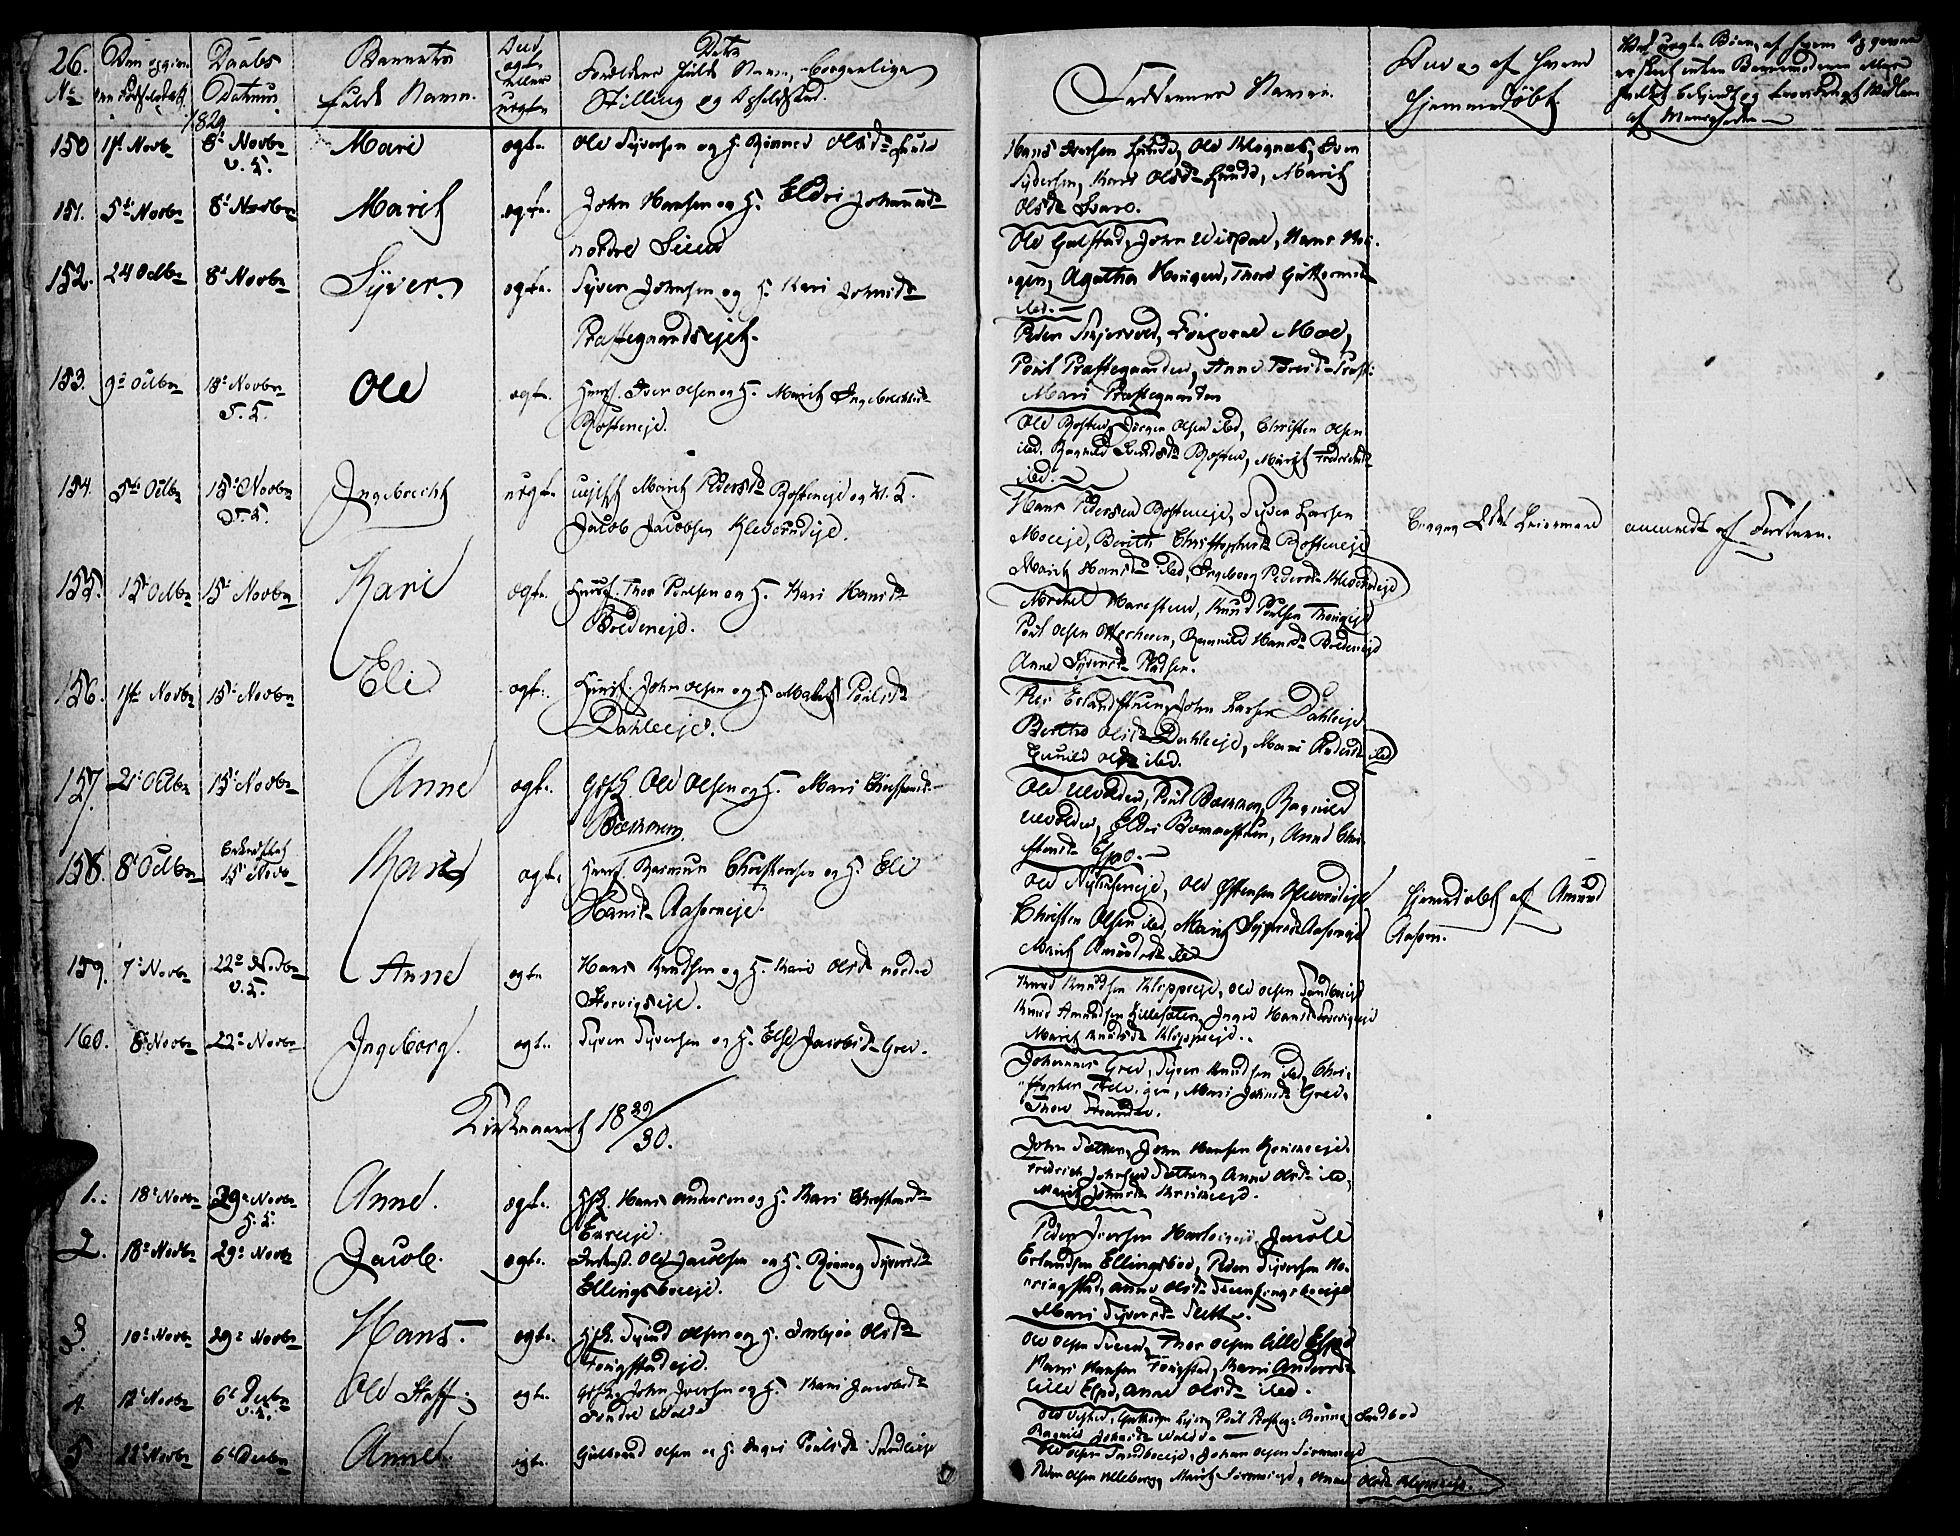 SAH, Vågå prestekontor, Ministerialbok nr. 4 /1, 1827-1842, s. 26